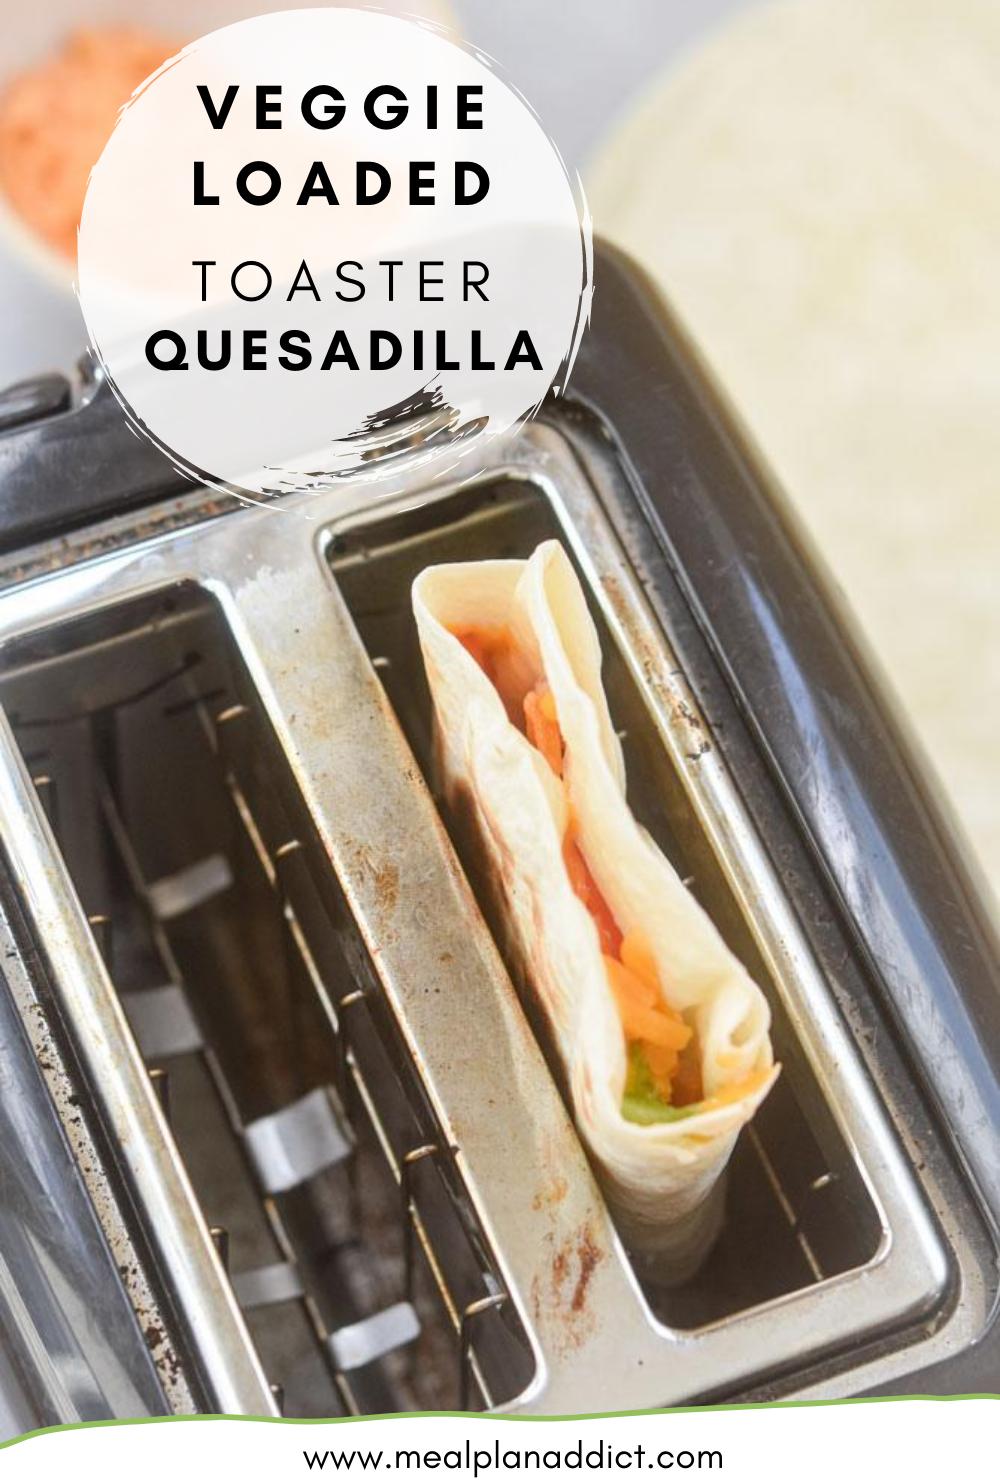 Veggie Loaded Toaster Quesadilla